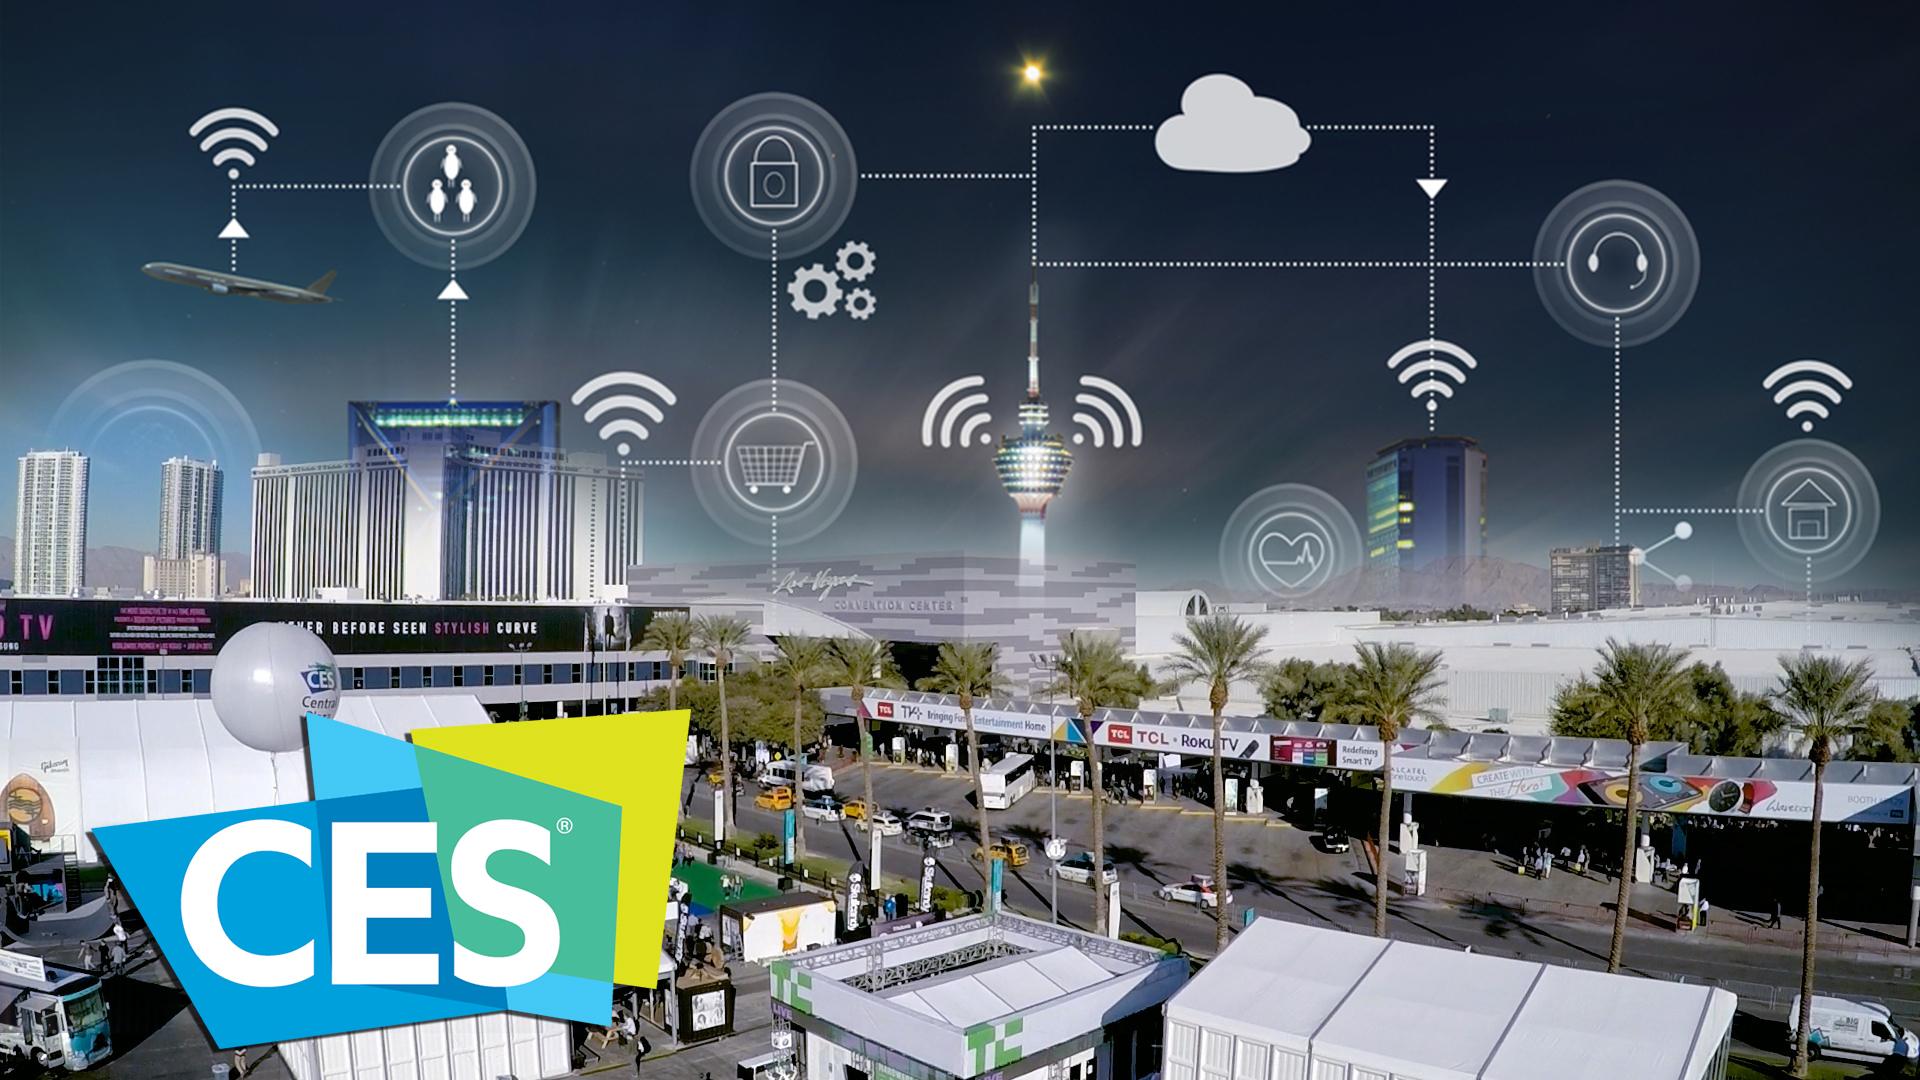 CES 2019: New Drone & UAV Technologies Predictions - Drone U™